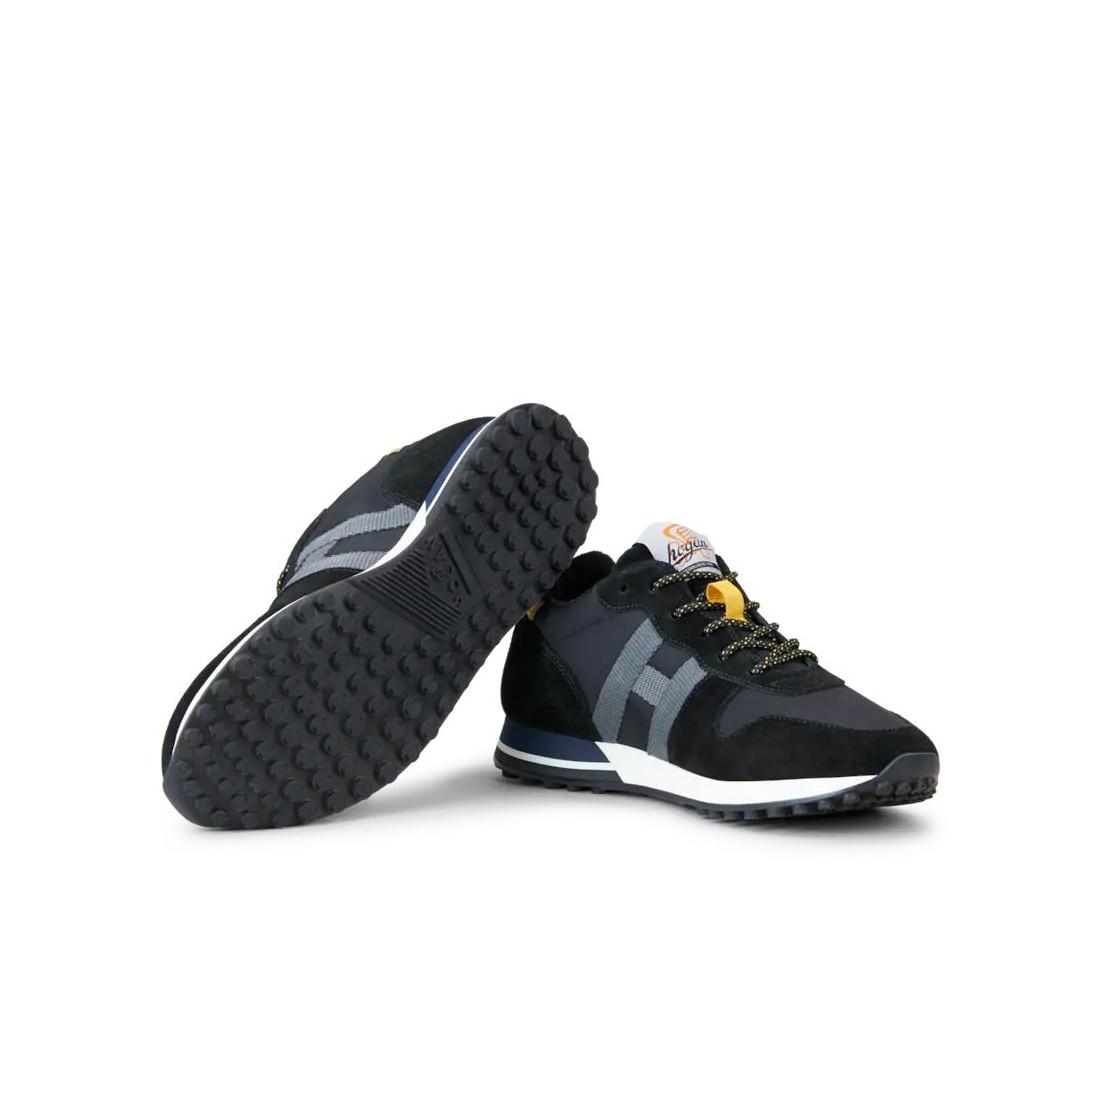 sneakers uomo hogan hxm3830an51n4x691p 6649